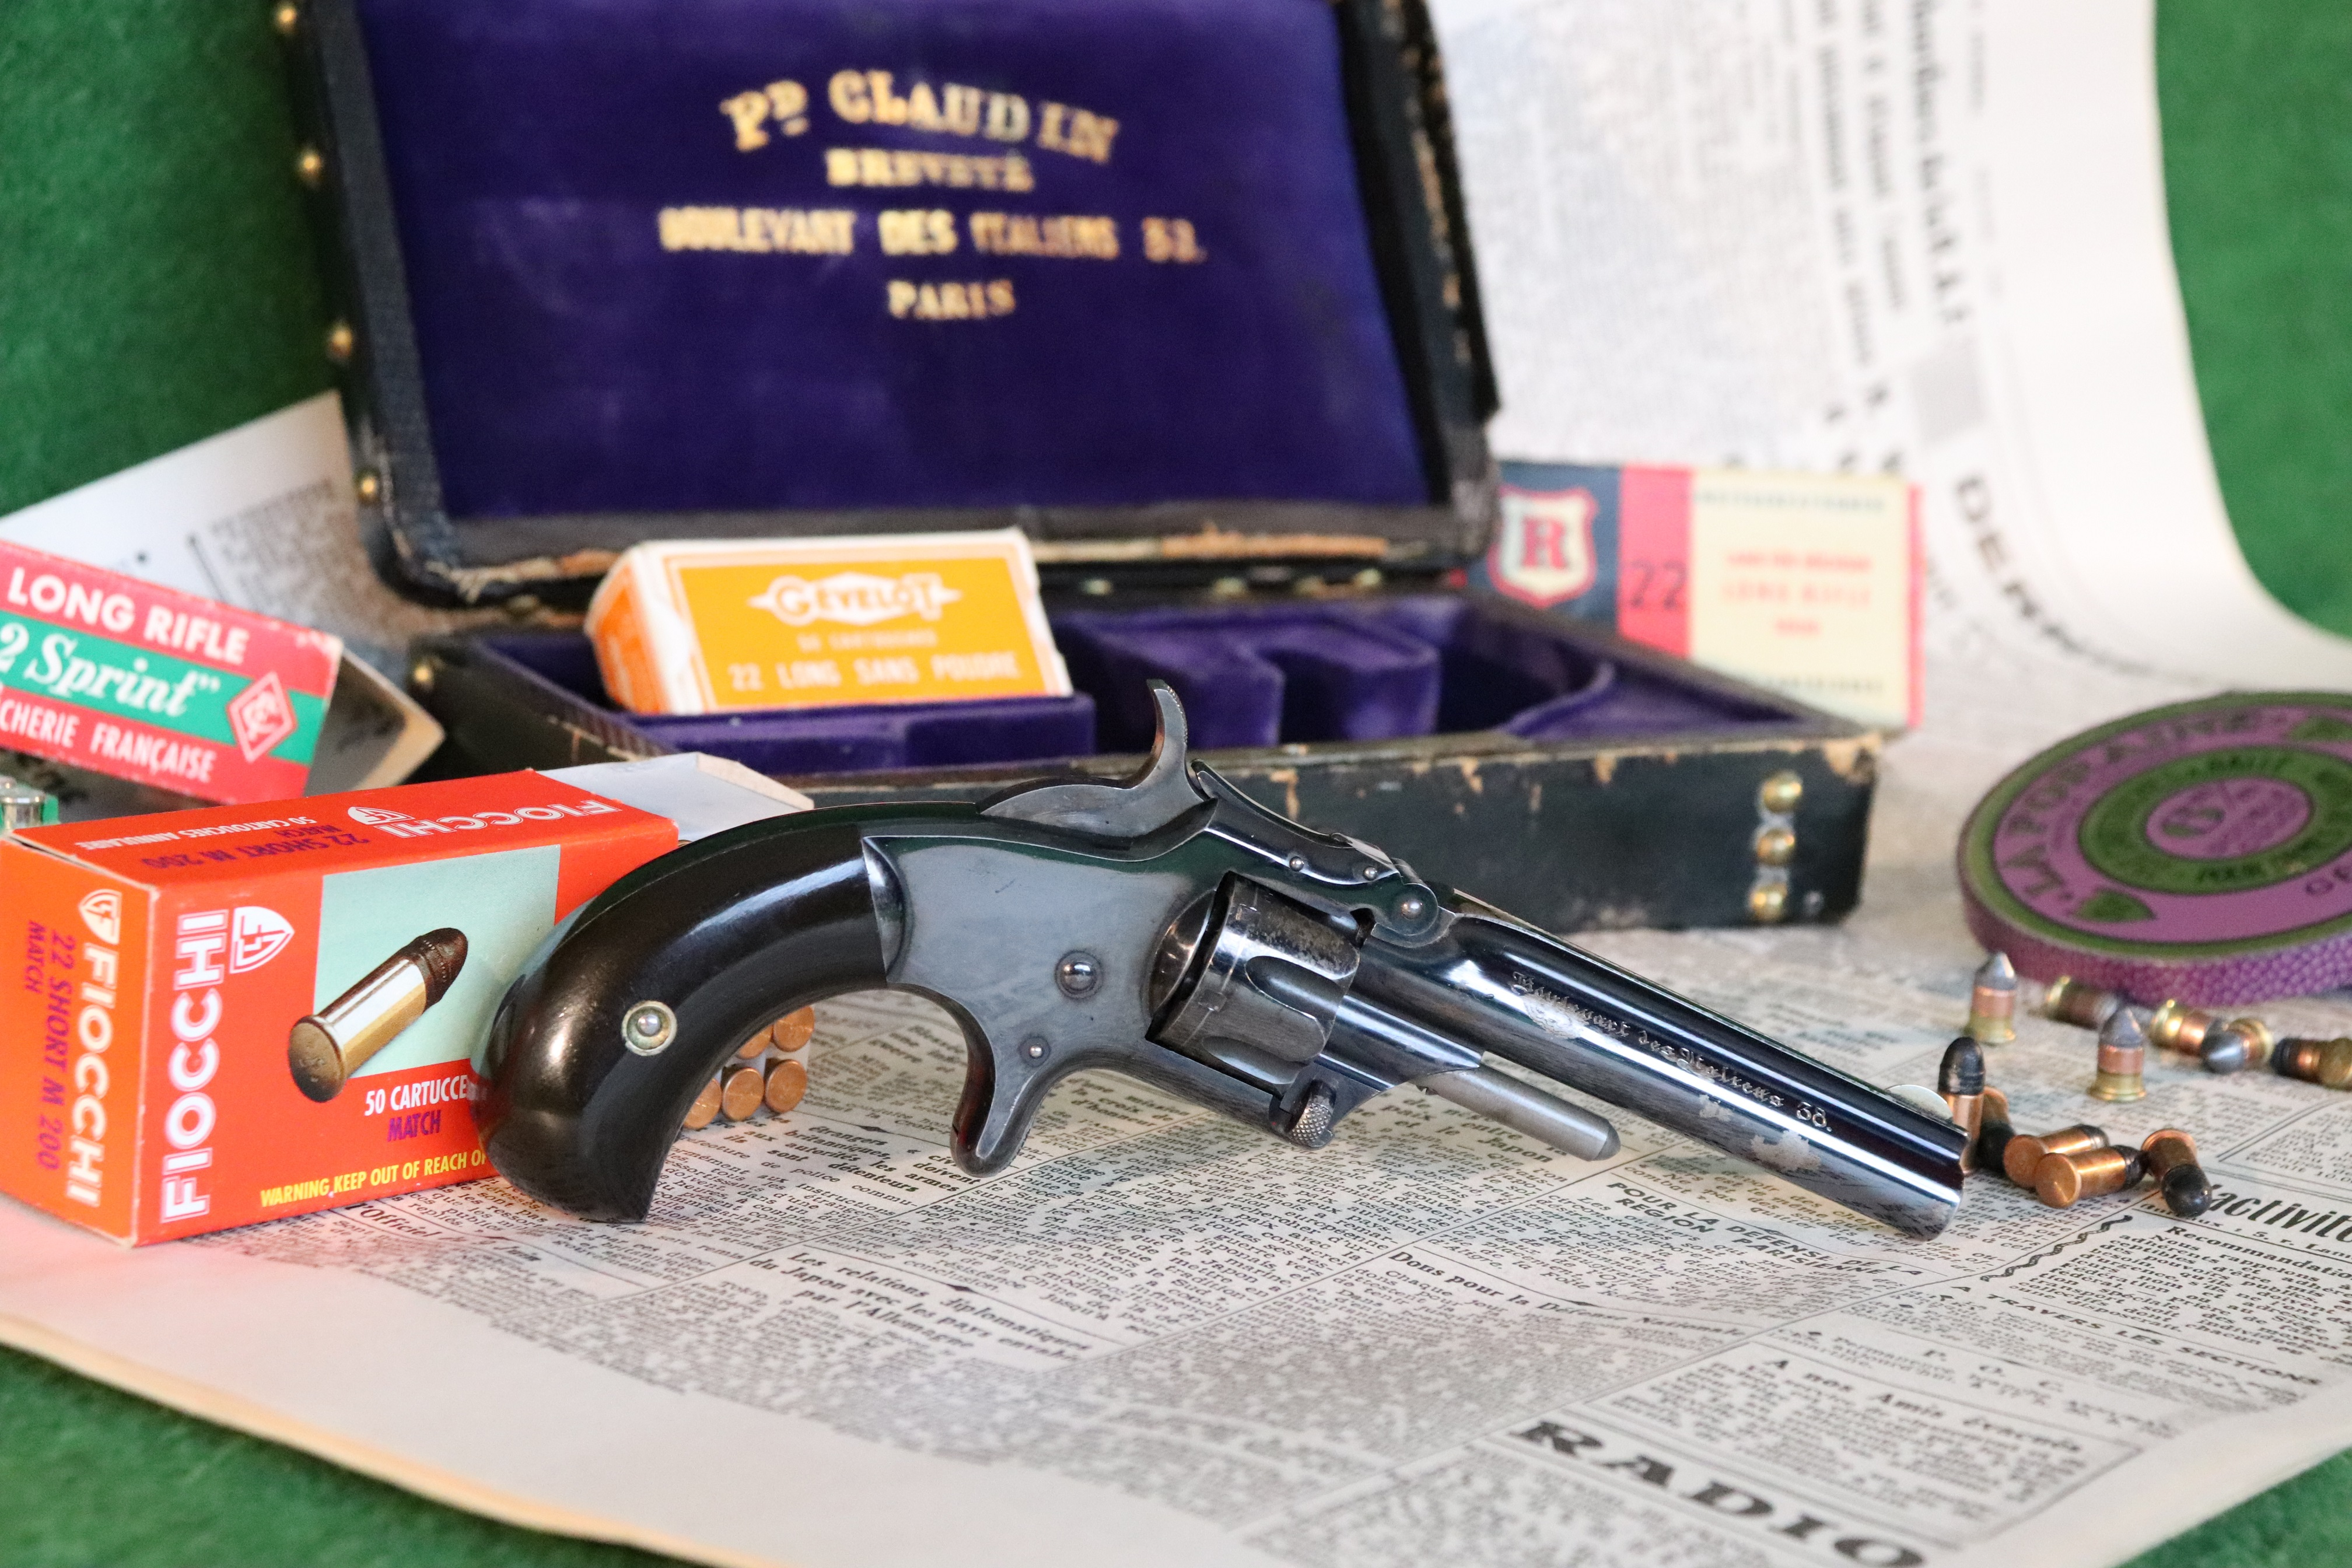 Revolver F. Claudin